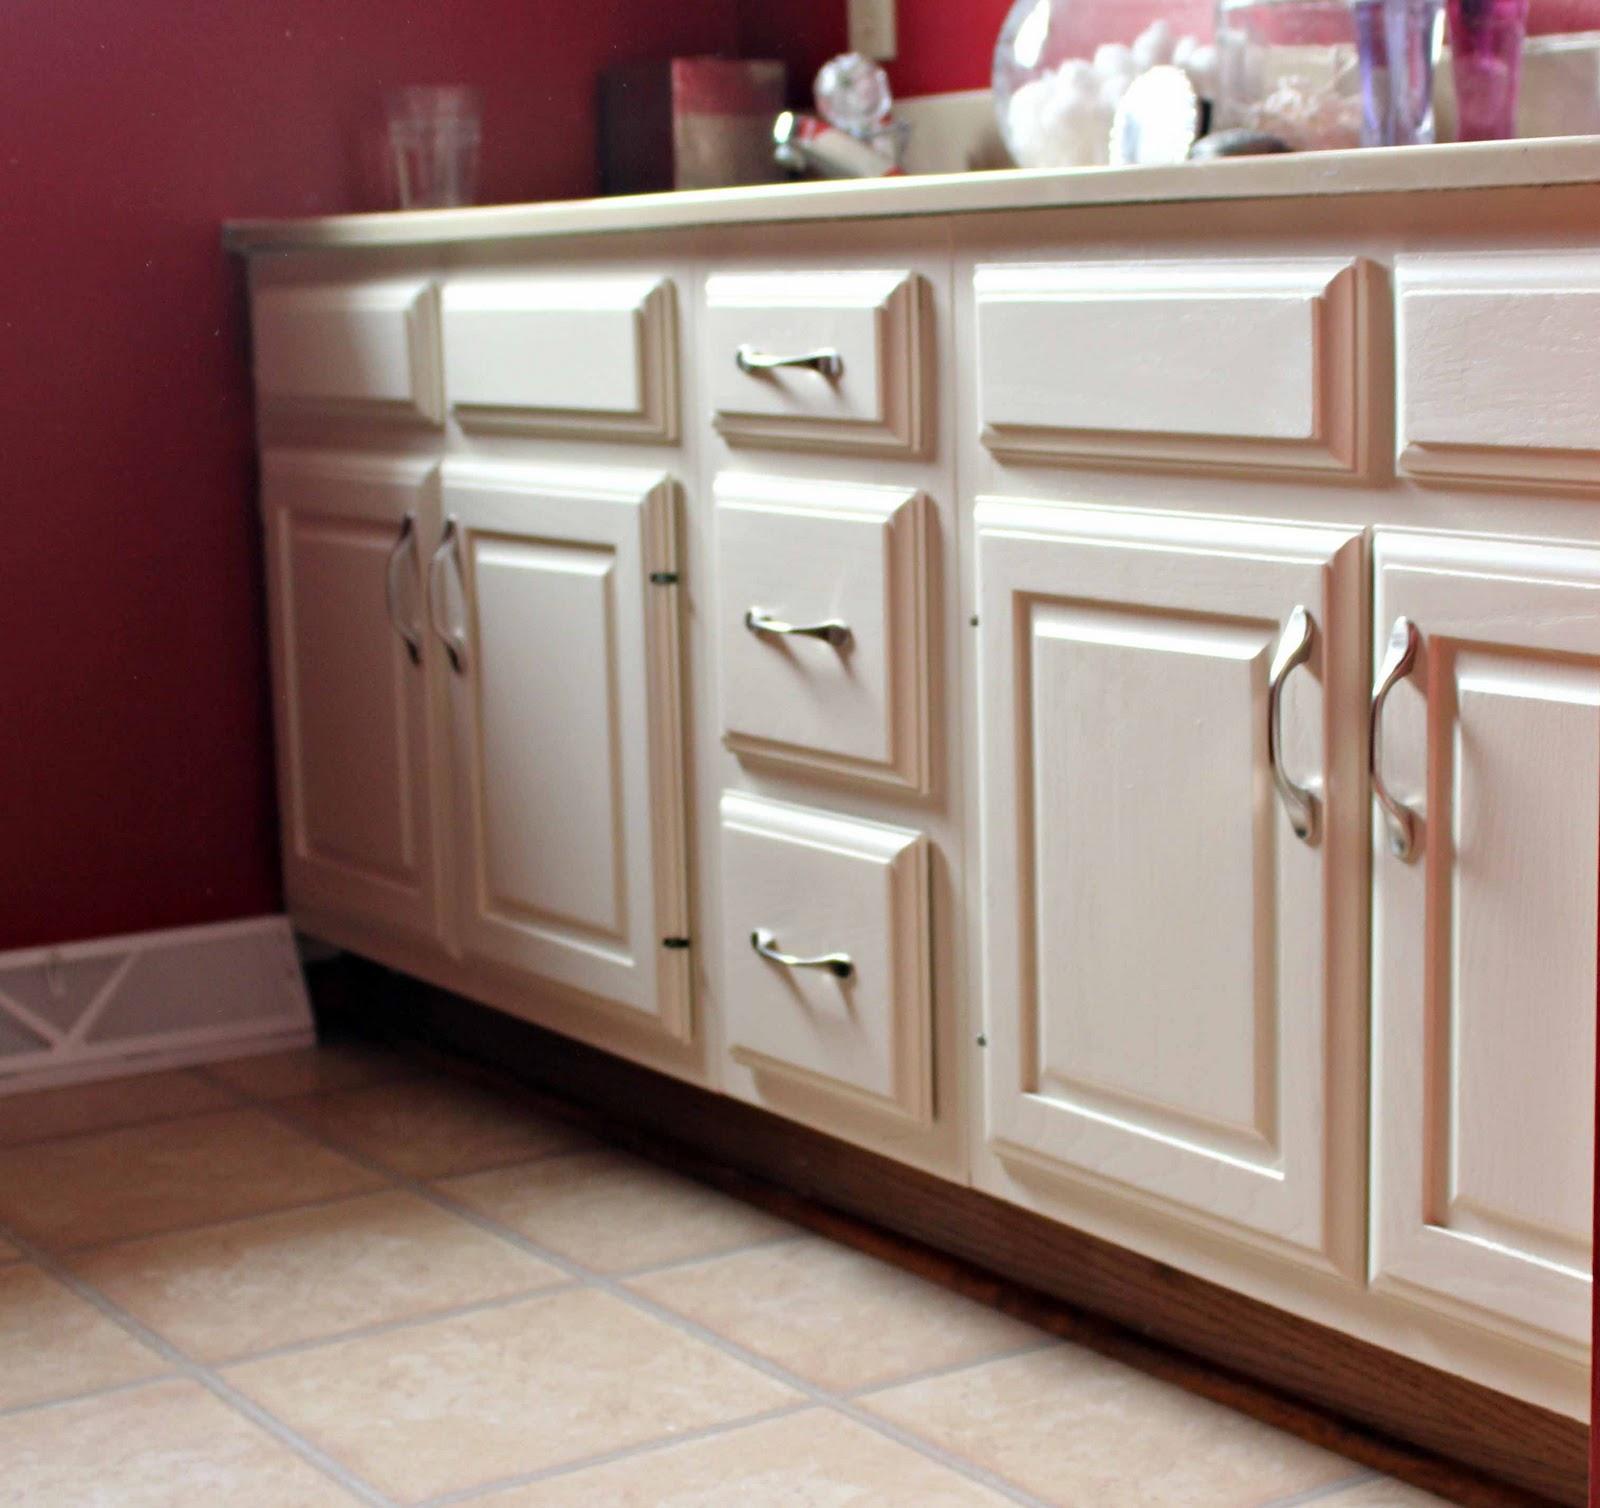 paint for bathroom cabinets - delonho